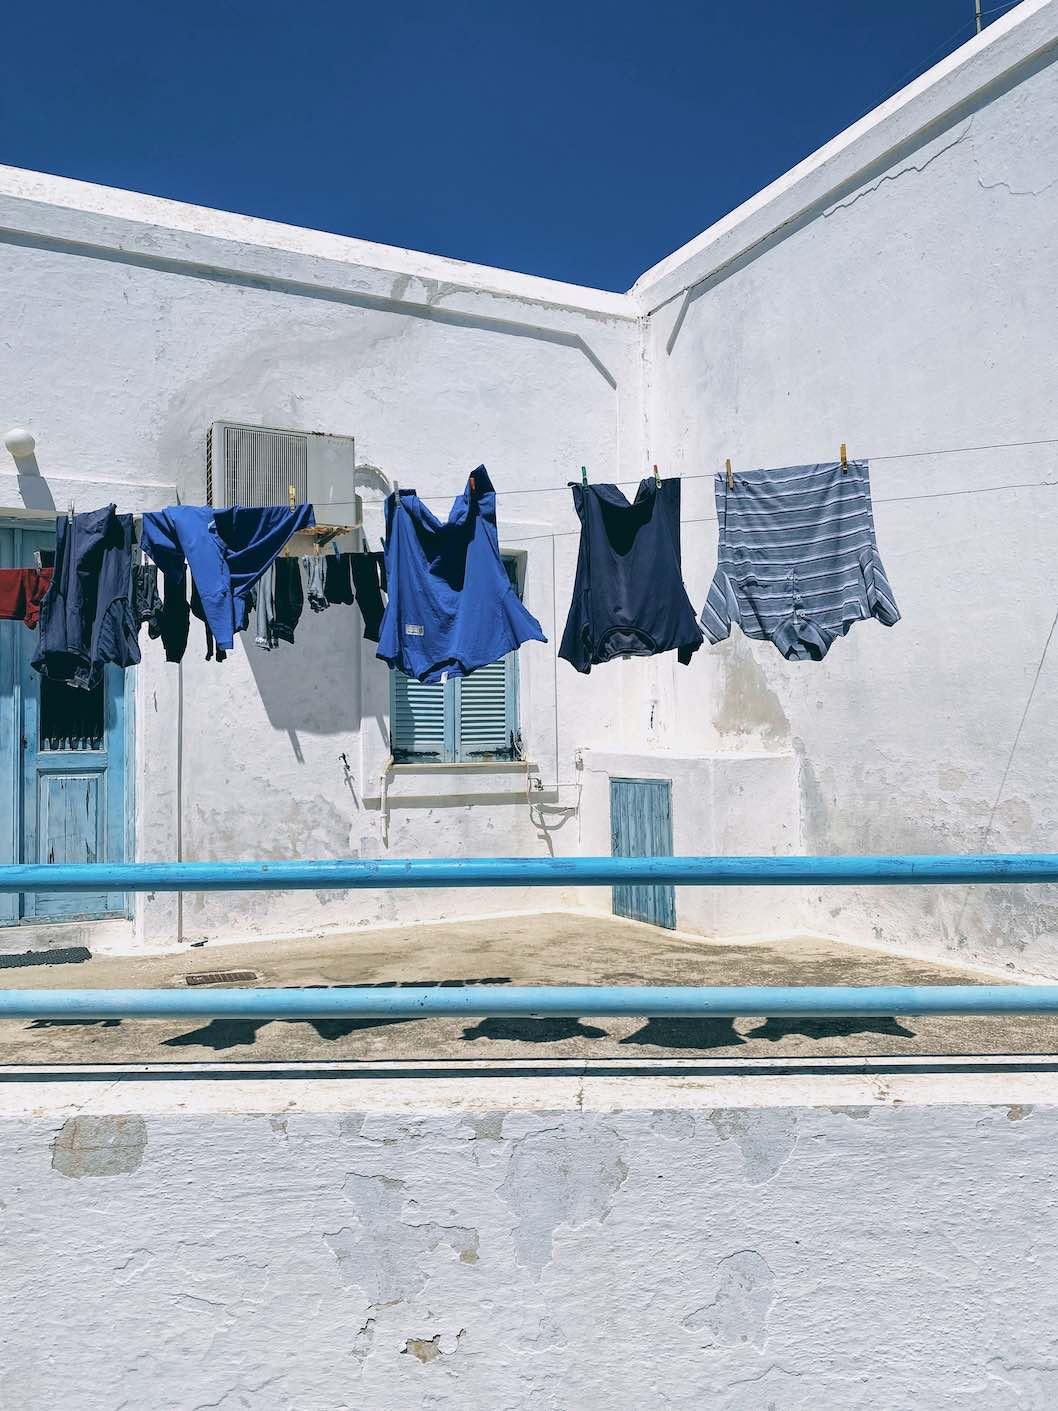 Travel Food People - Schinoussa, Greece